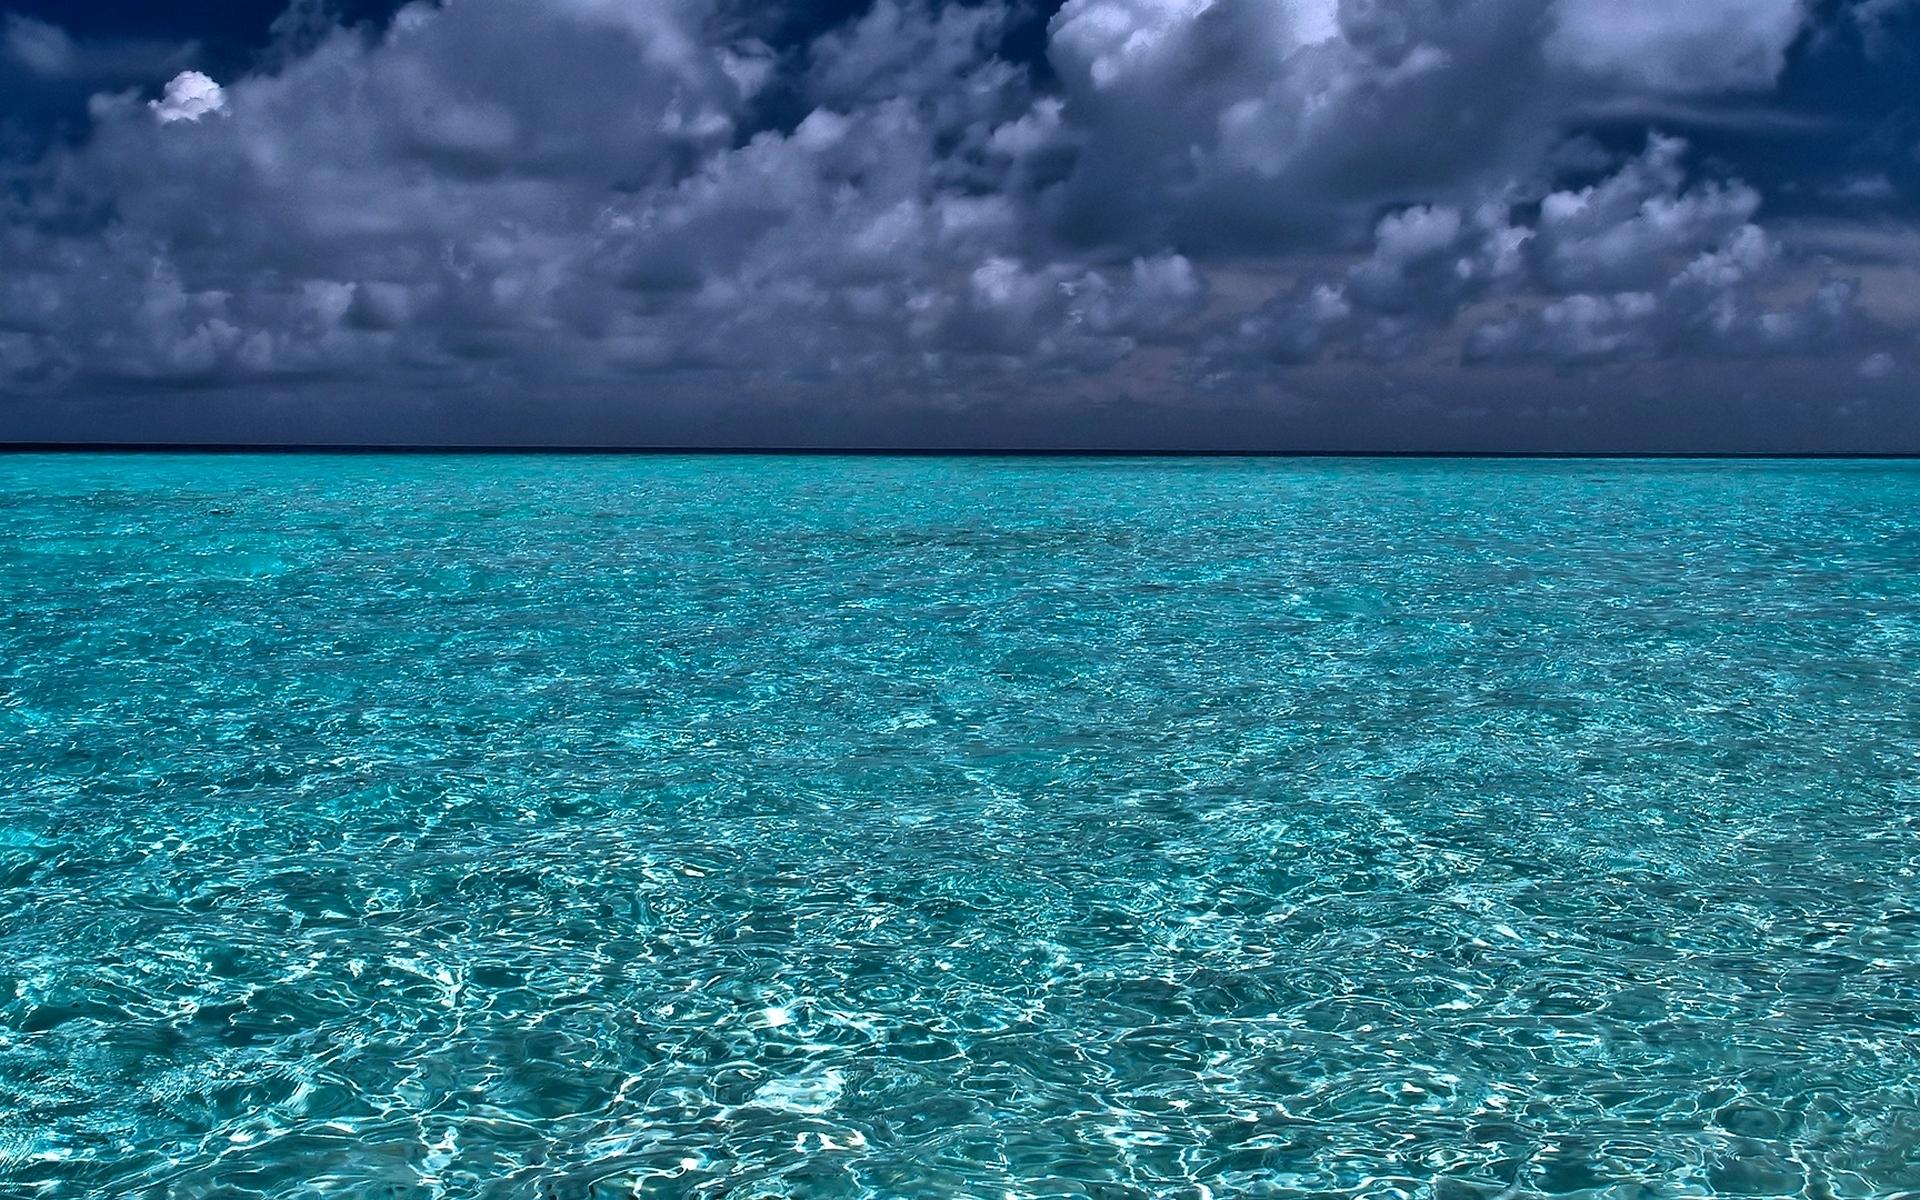 прозрачная вода без смс